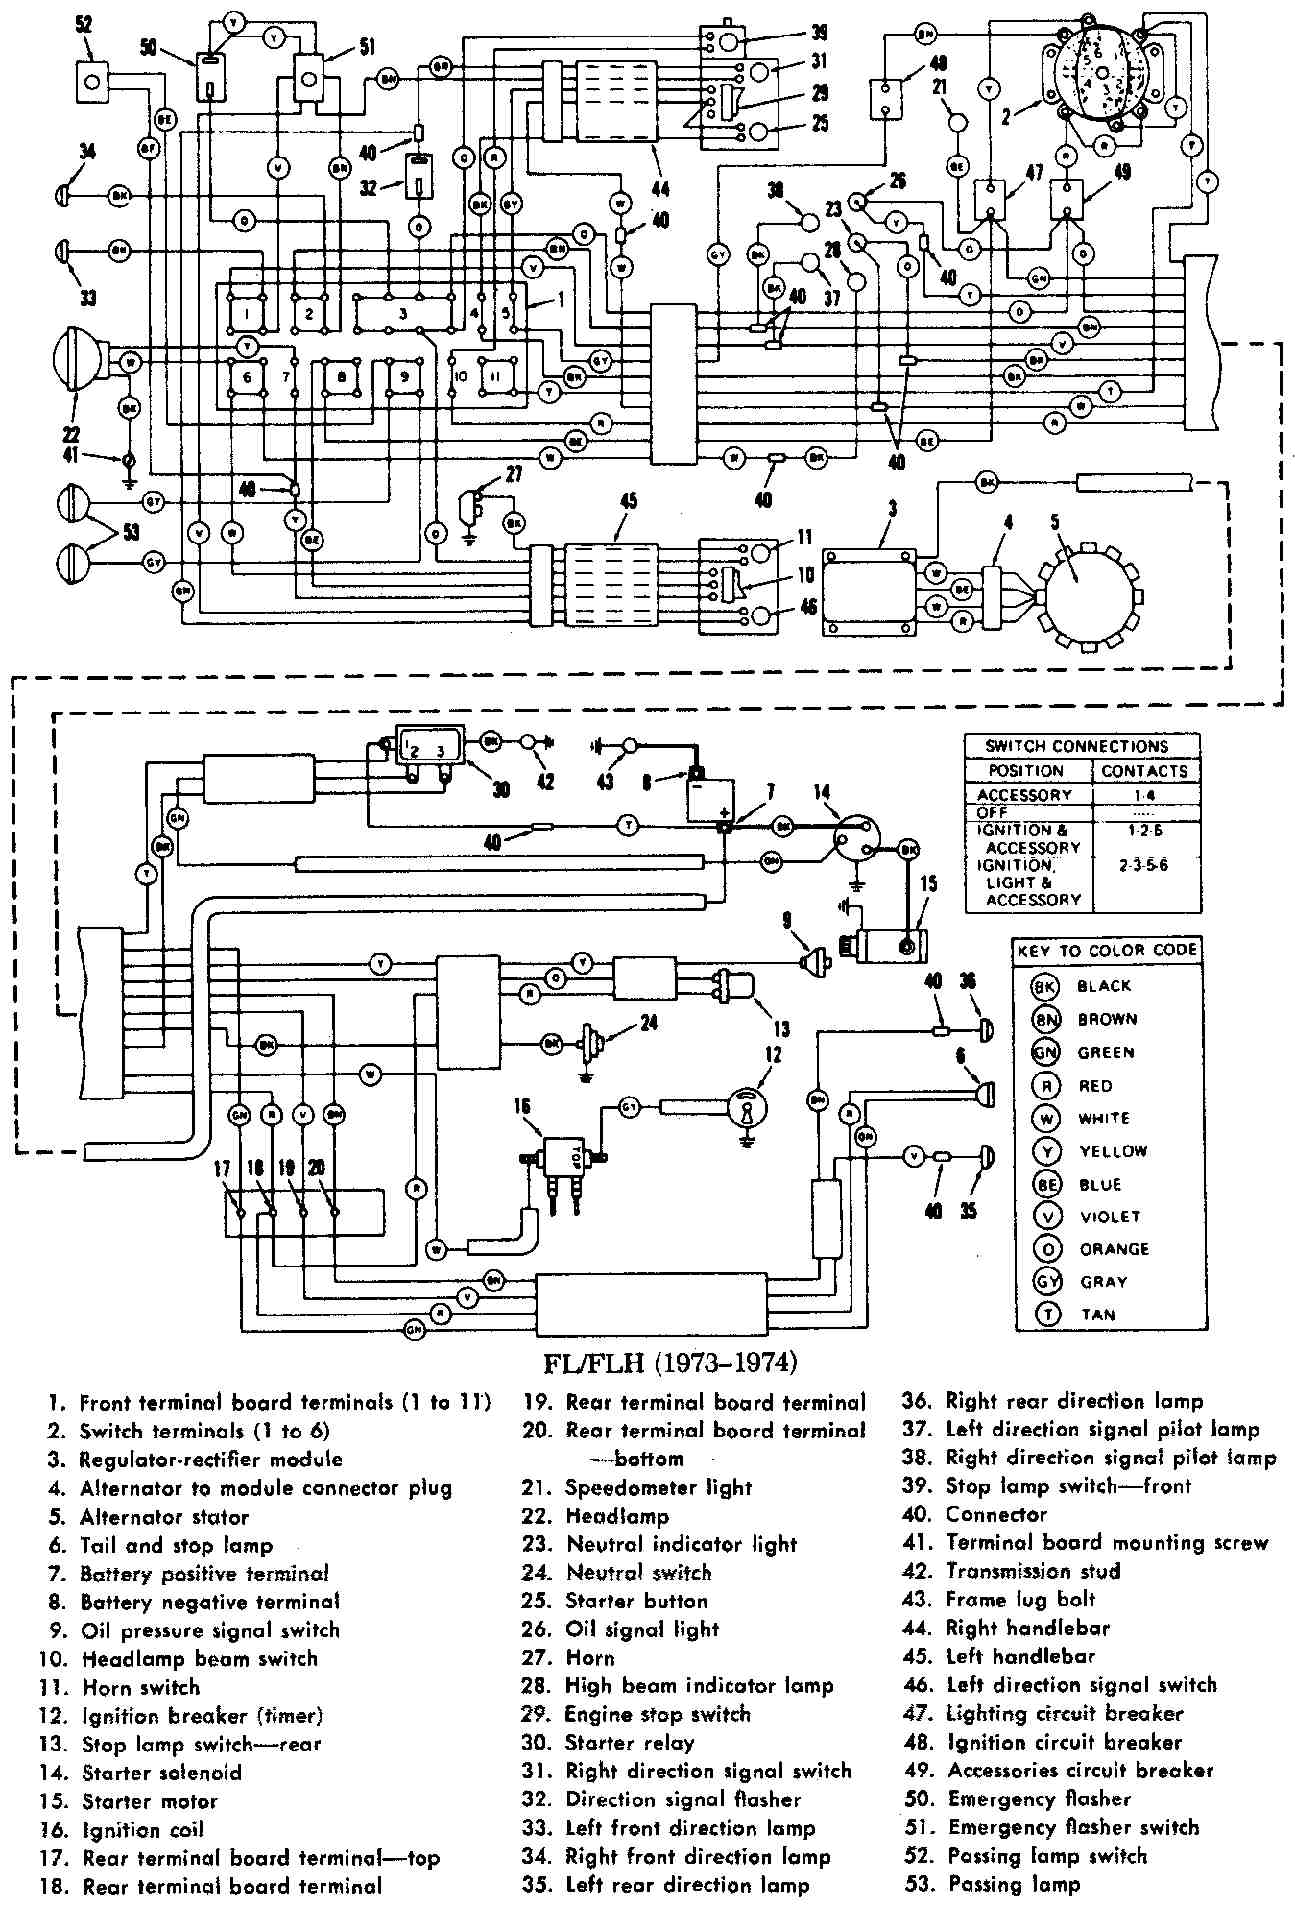 1968 amc amx starter wiring diagram pontiac fiero wiring